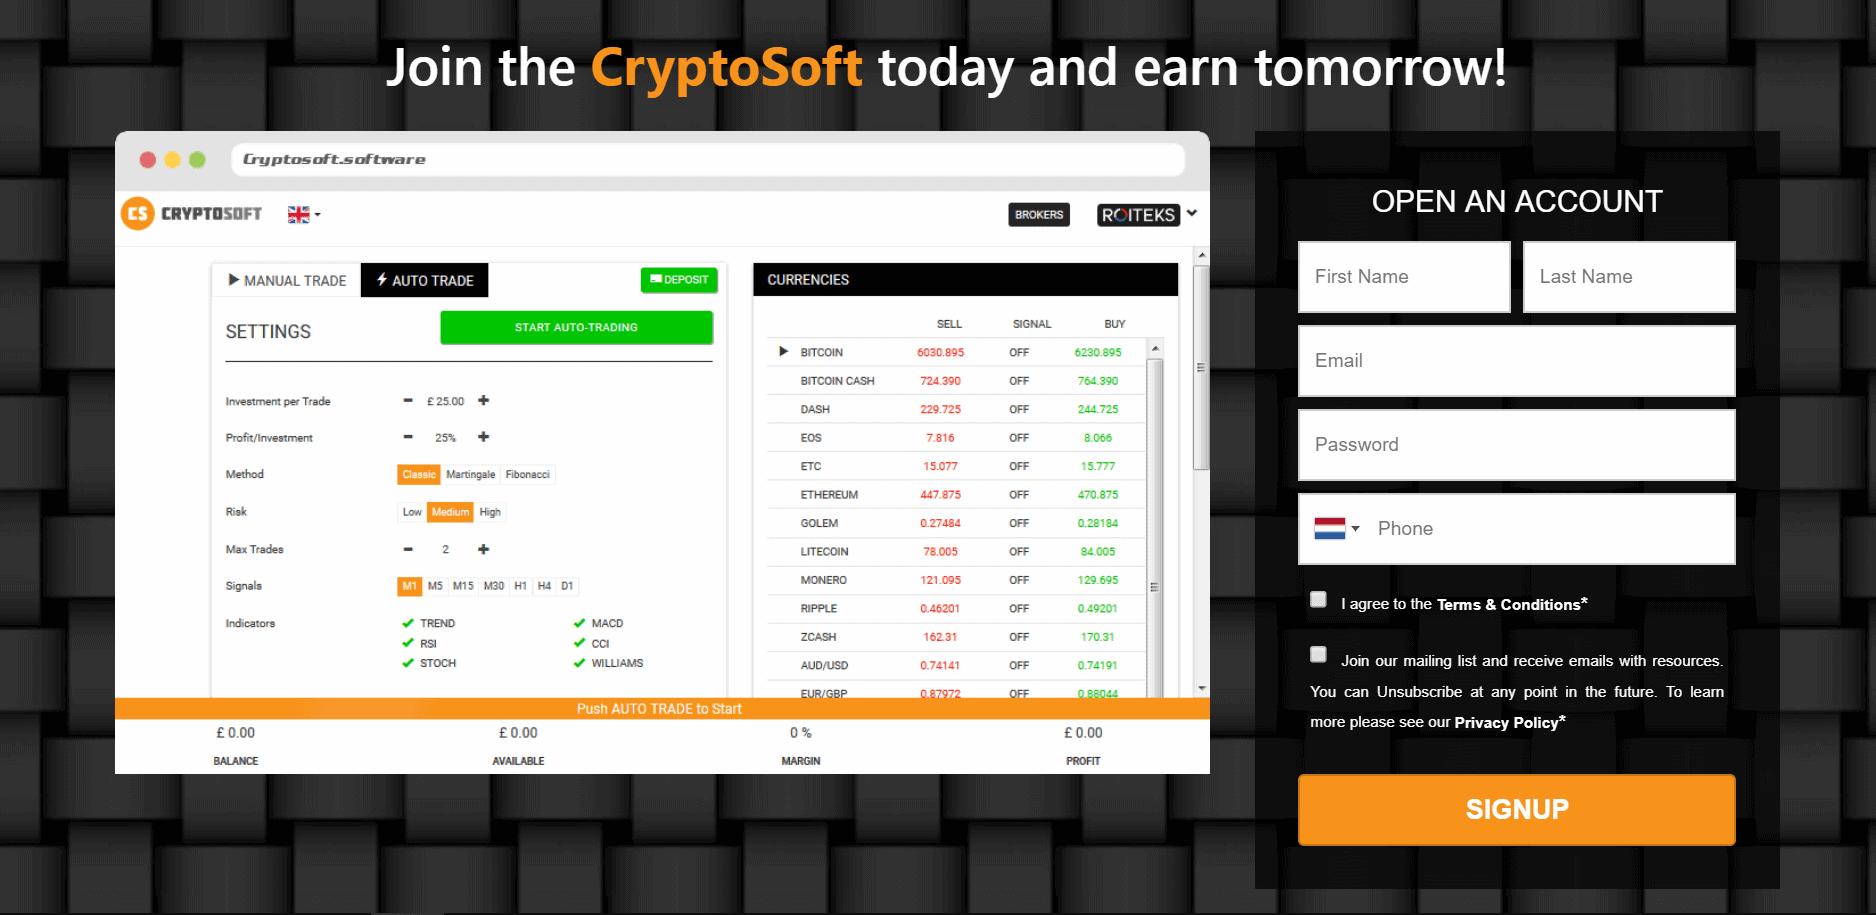 Cryptosoft app home screen August 15, 2020